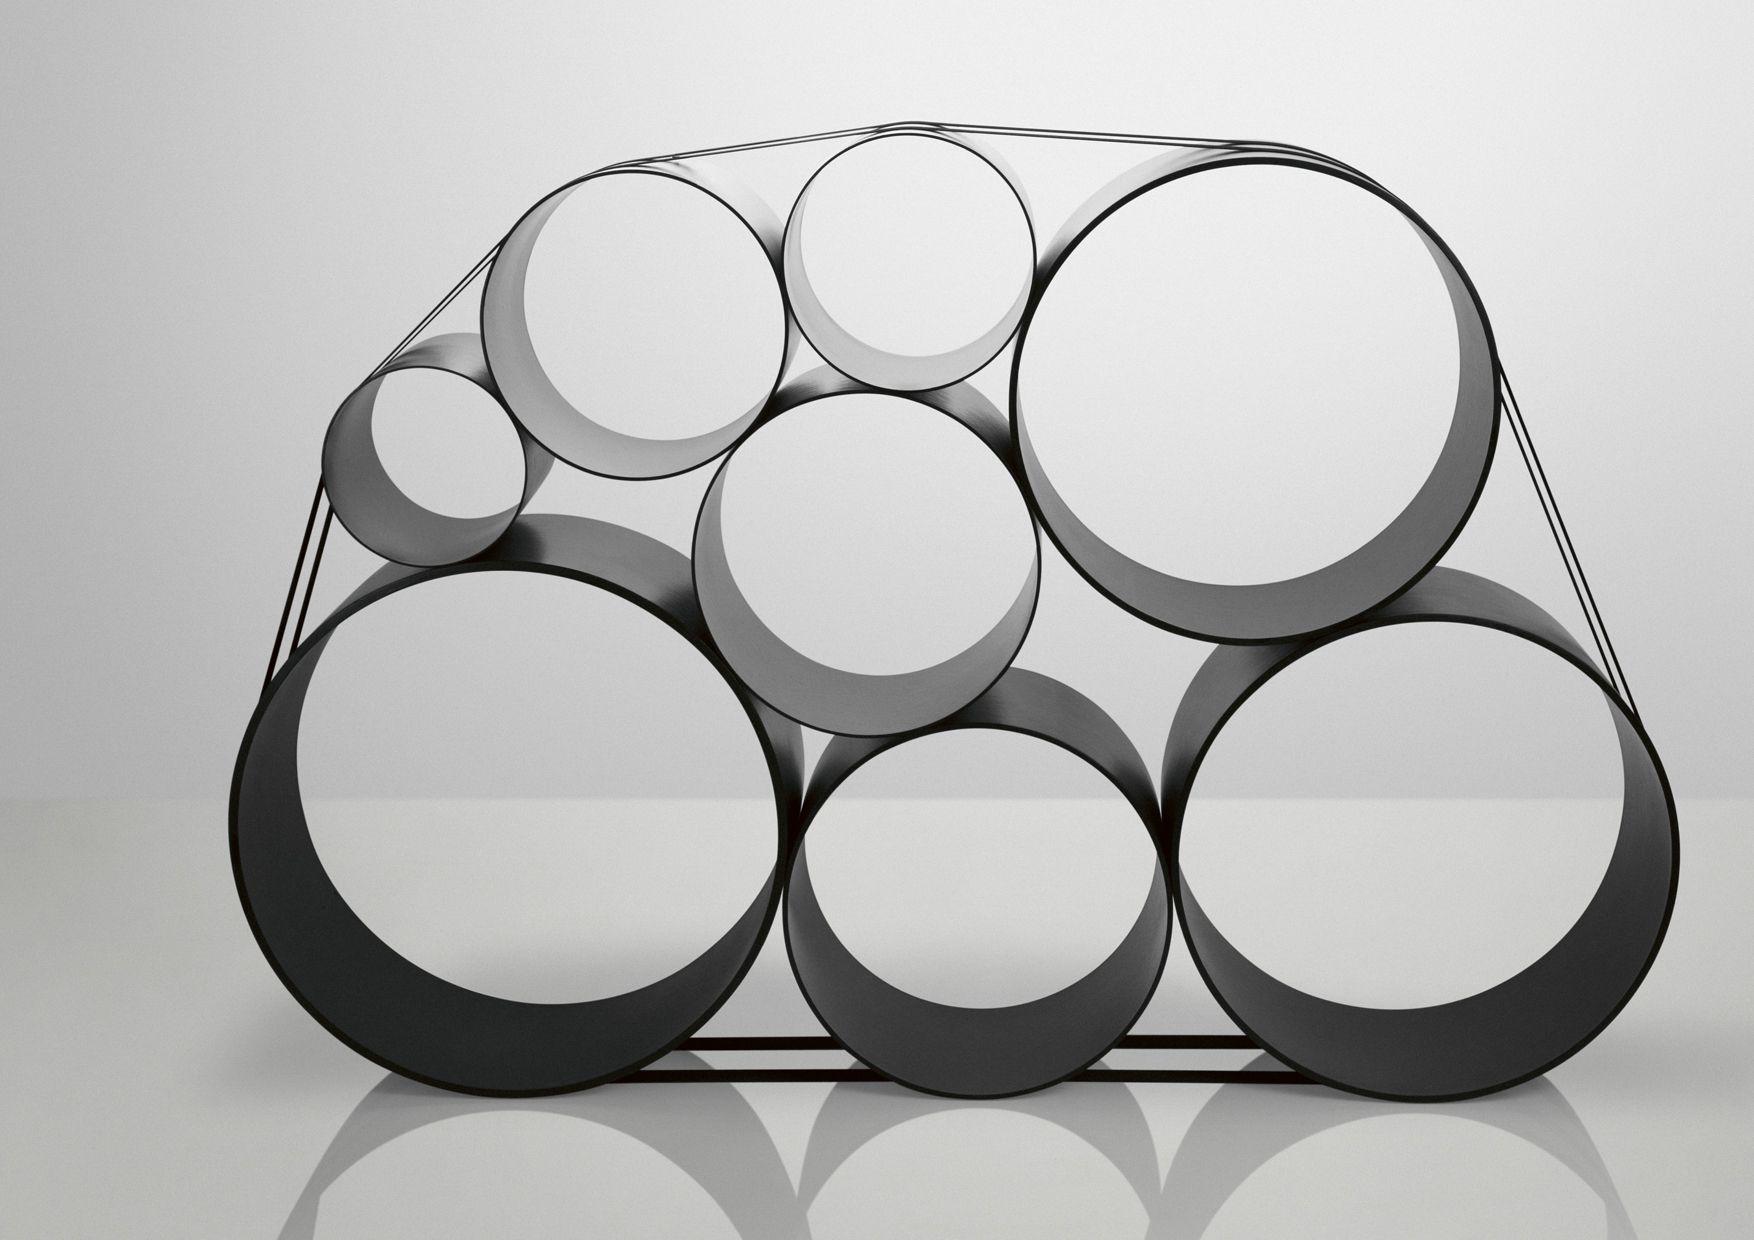 OTO100 / Design by Pil Bredahl / Muuto